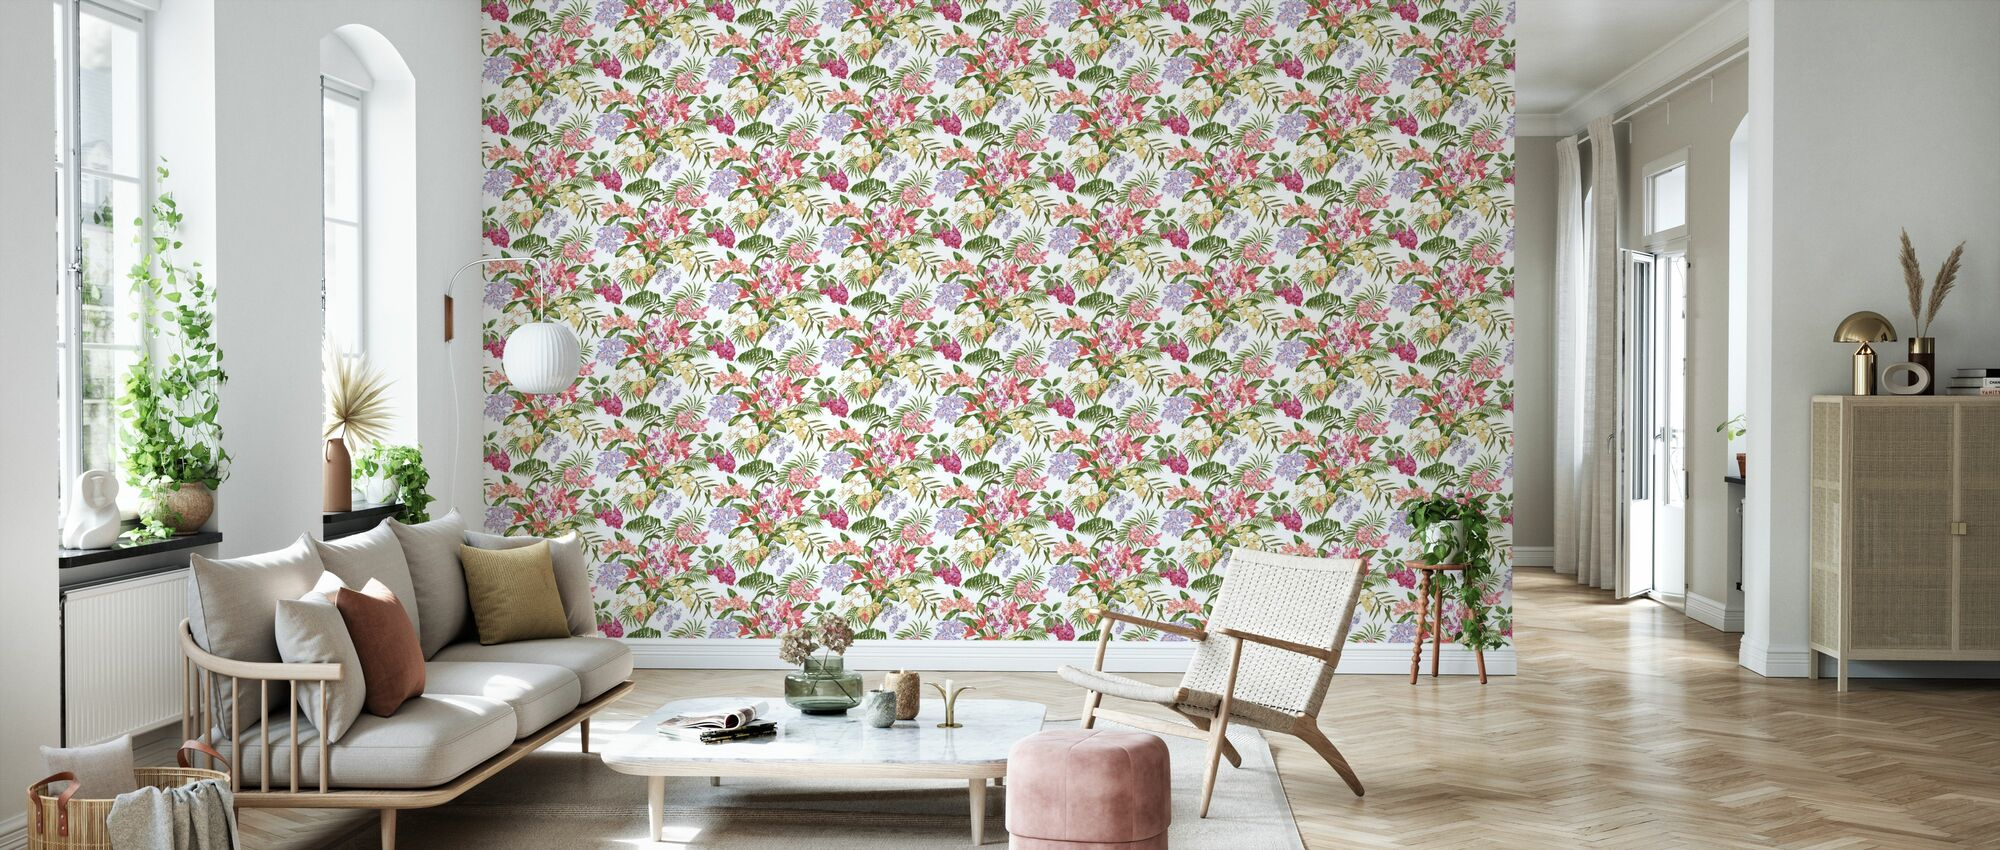 Tropic Bouquet Multi - Wallpaper - Living Room